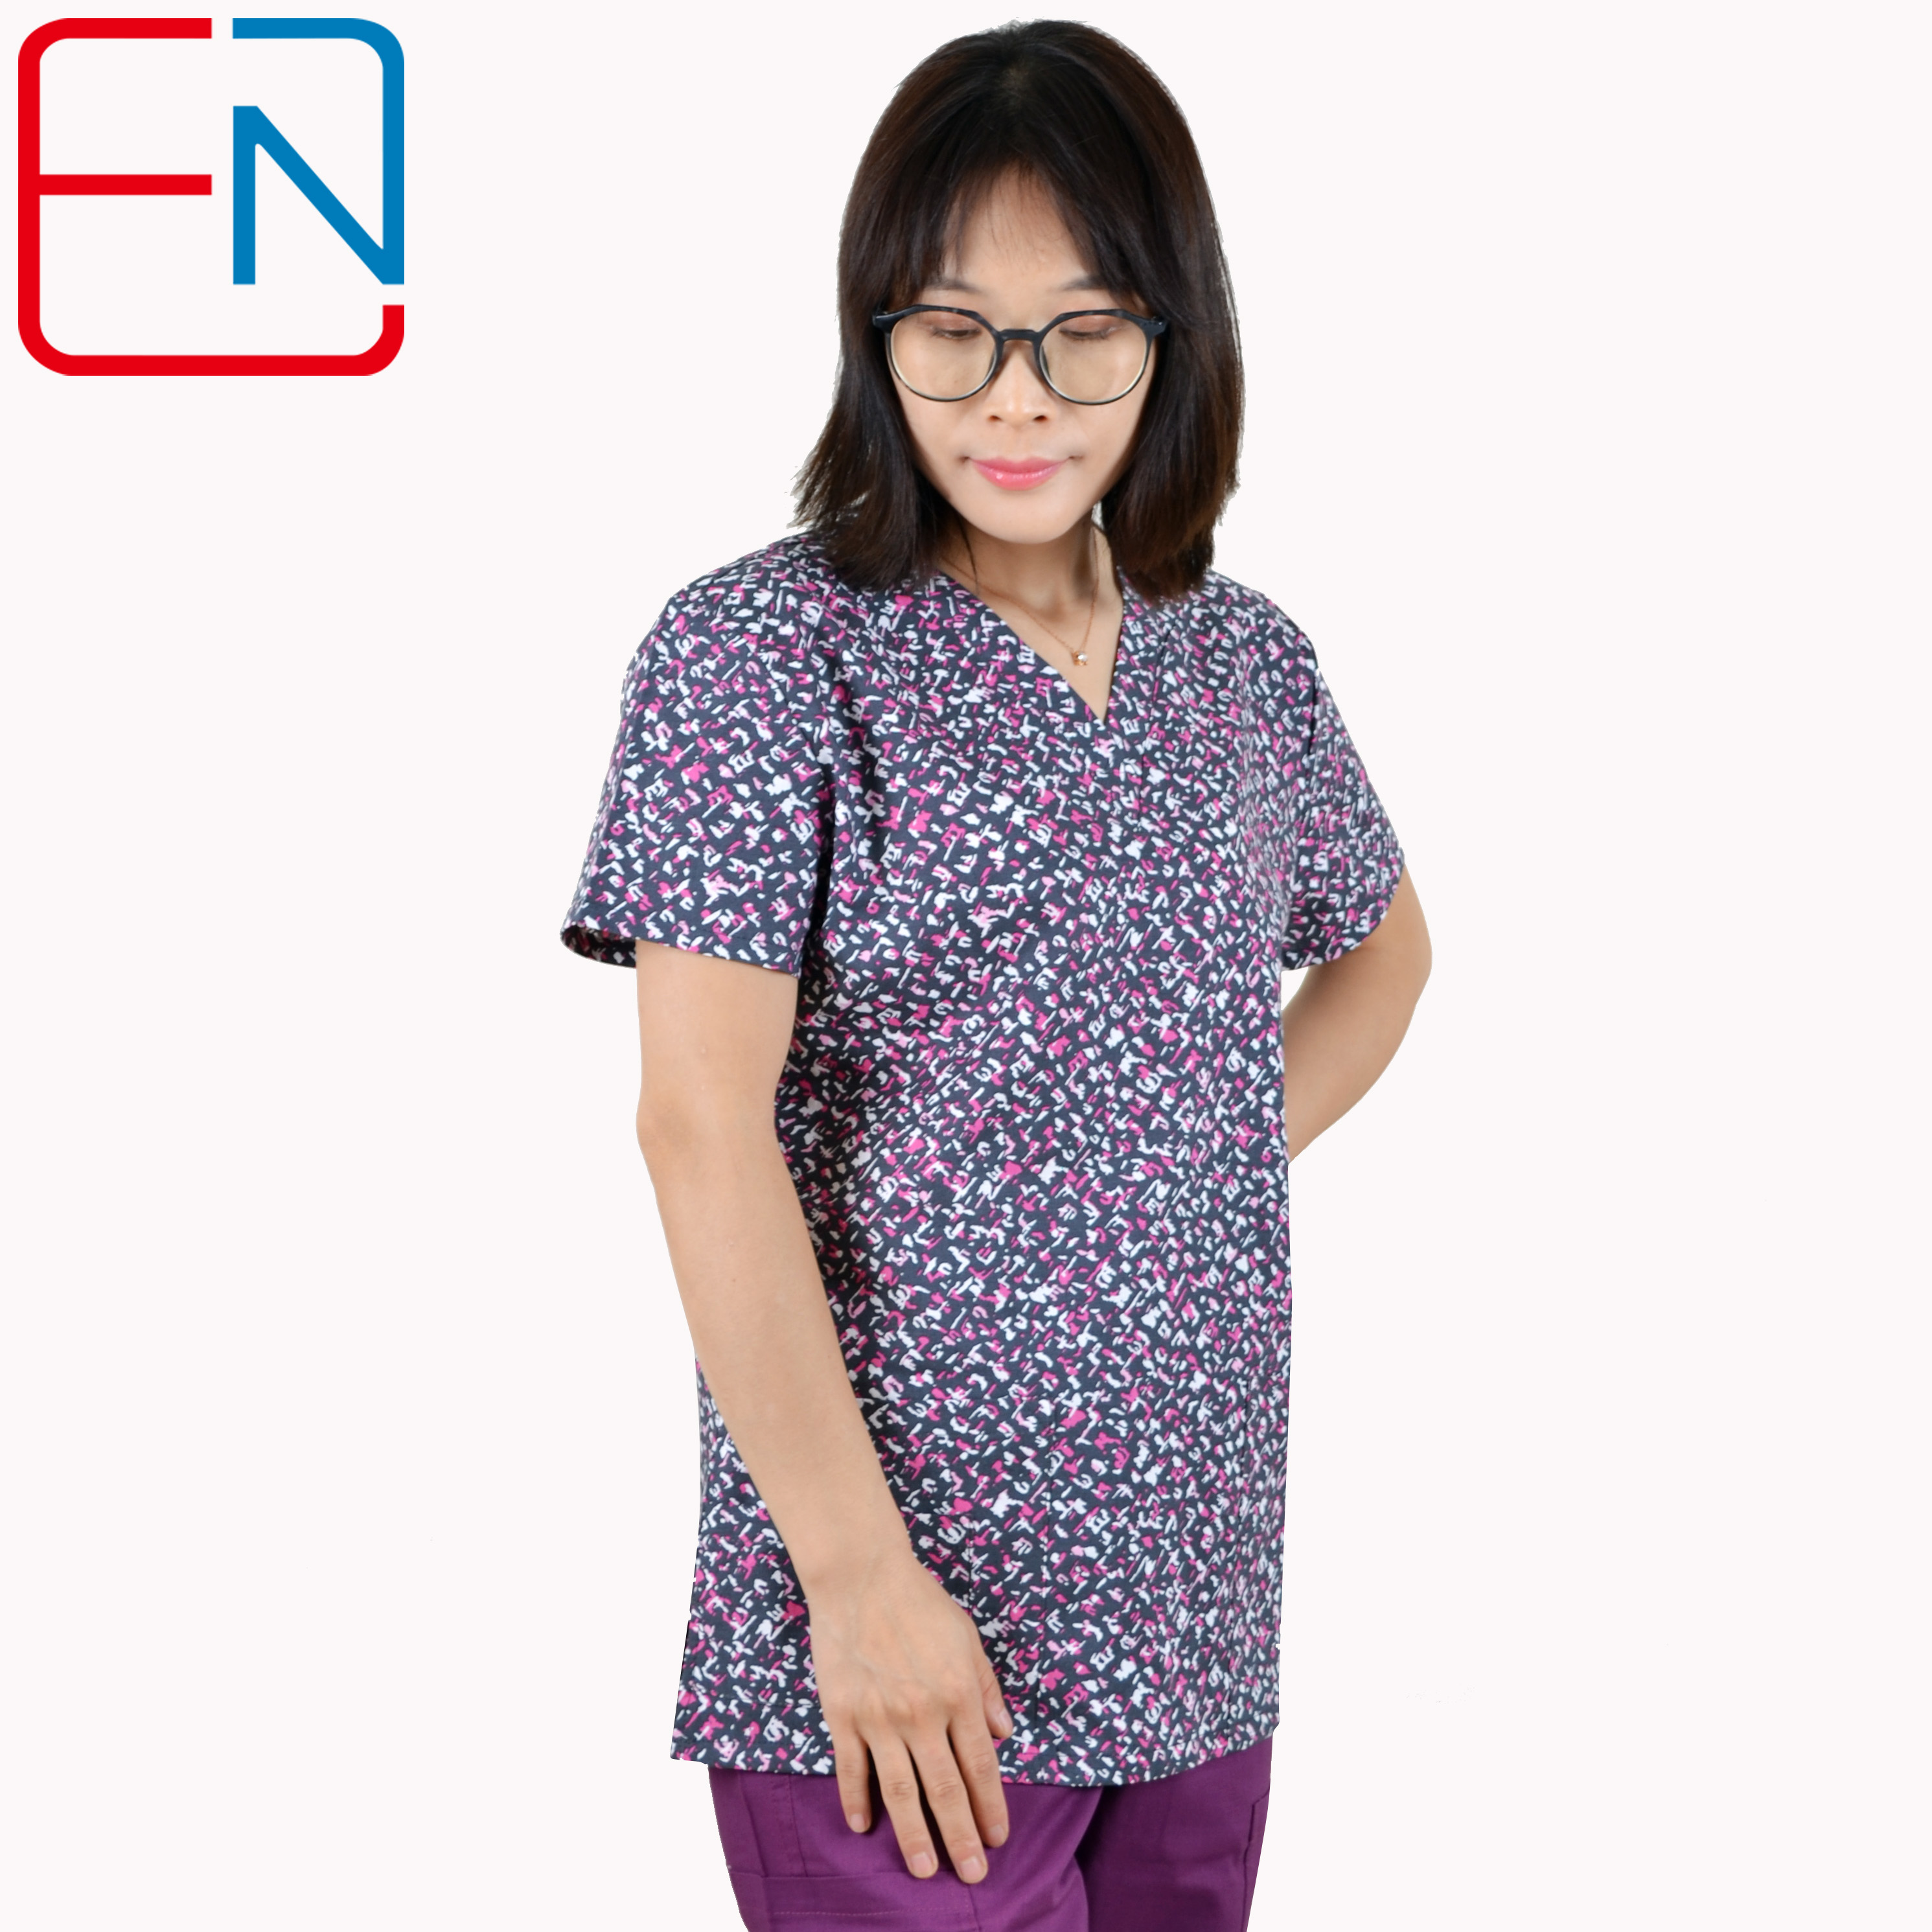 Image 4 - Hennar scrub tops in 100% cotton ,women scrub tops,women medical uniformsscrub topwomens medical uniformsmedical uniforms -